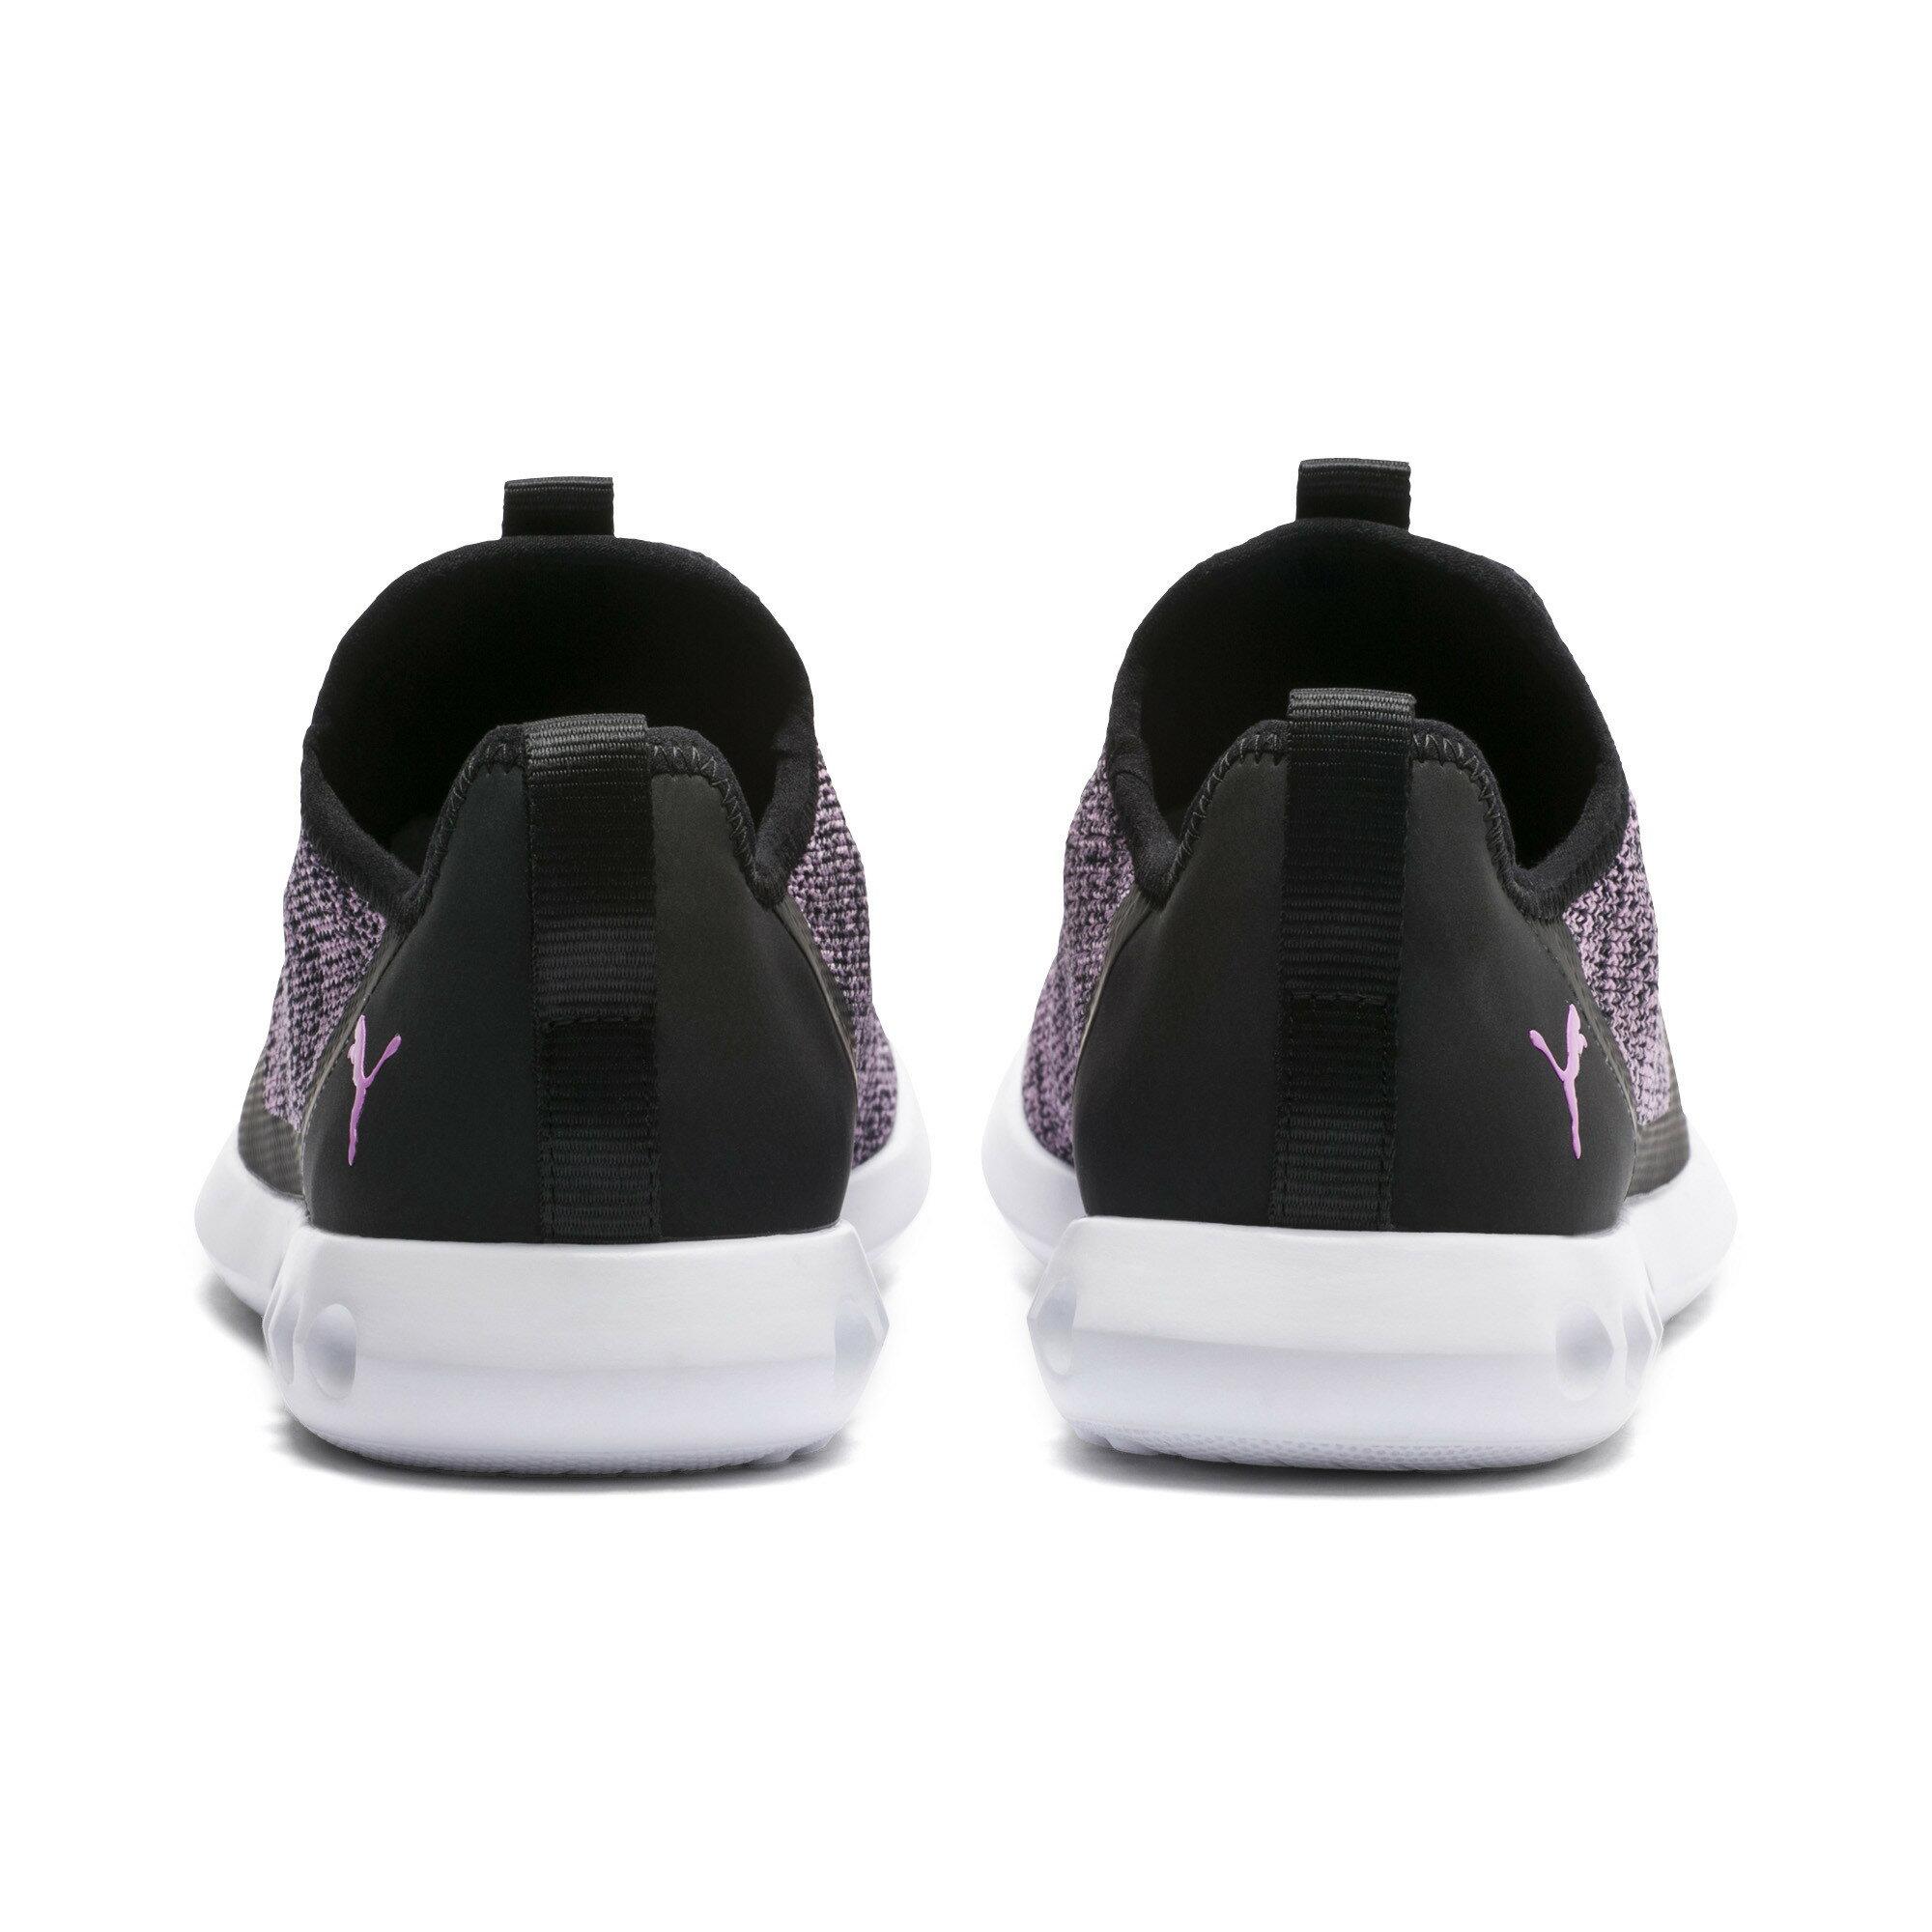 ce3241f1b51 Official Puma Store  PUMA Carson 2 X Knit Women s Running Shoes ...